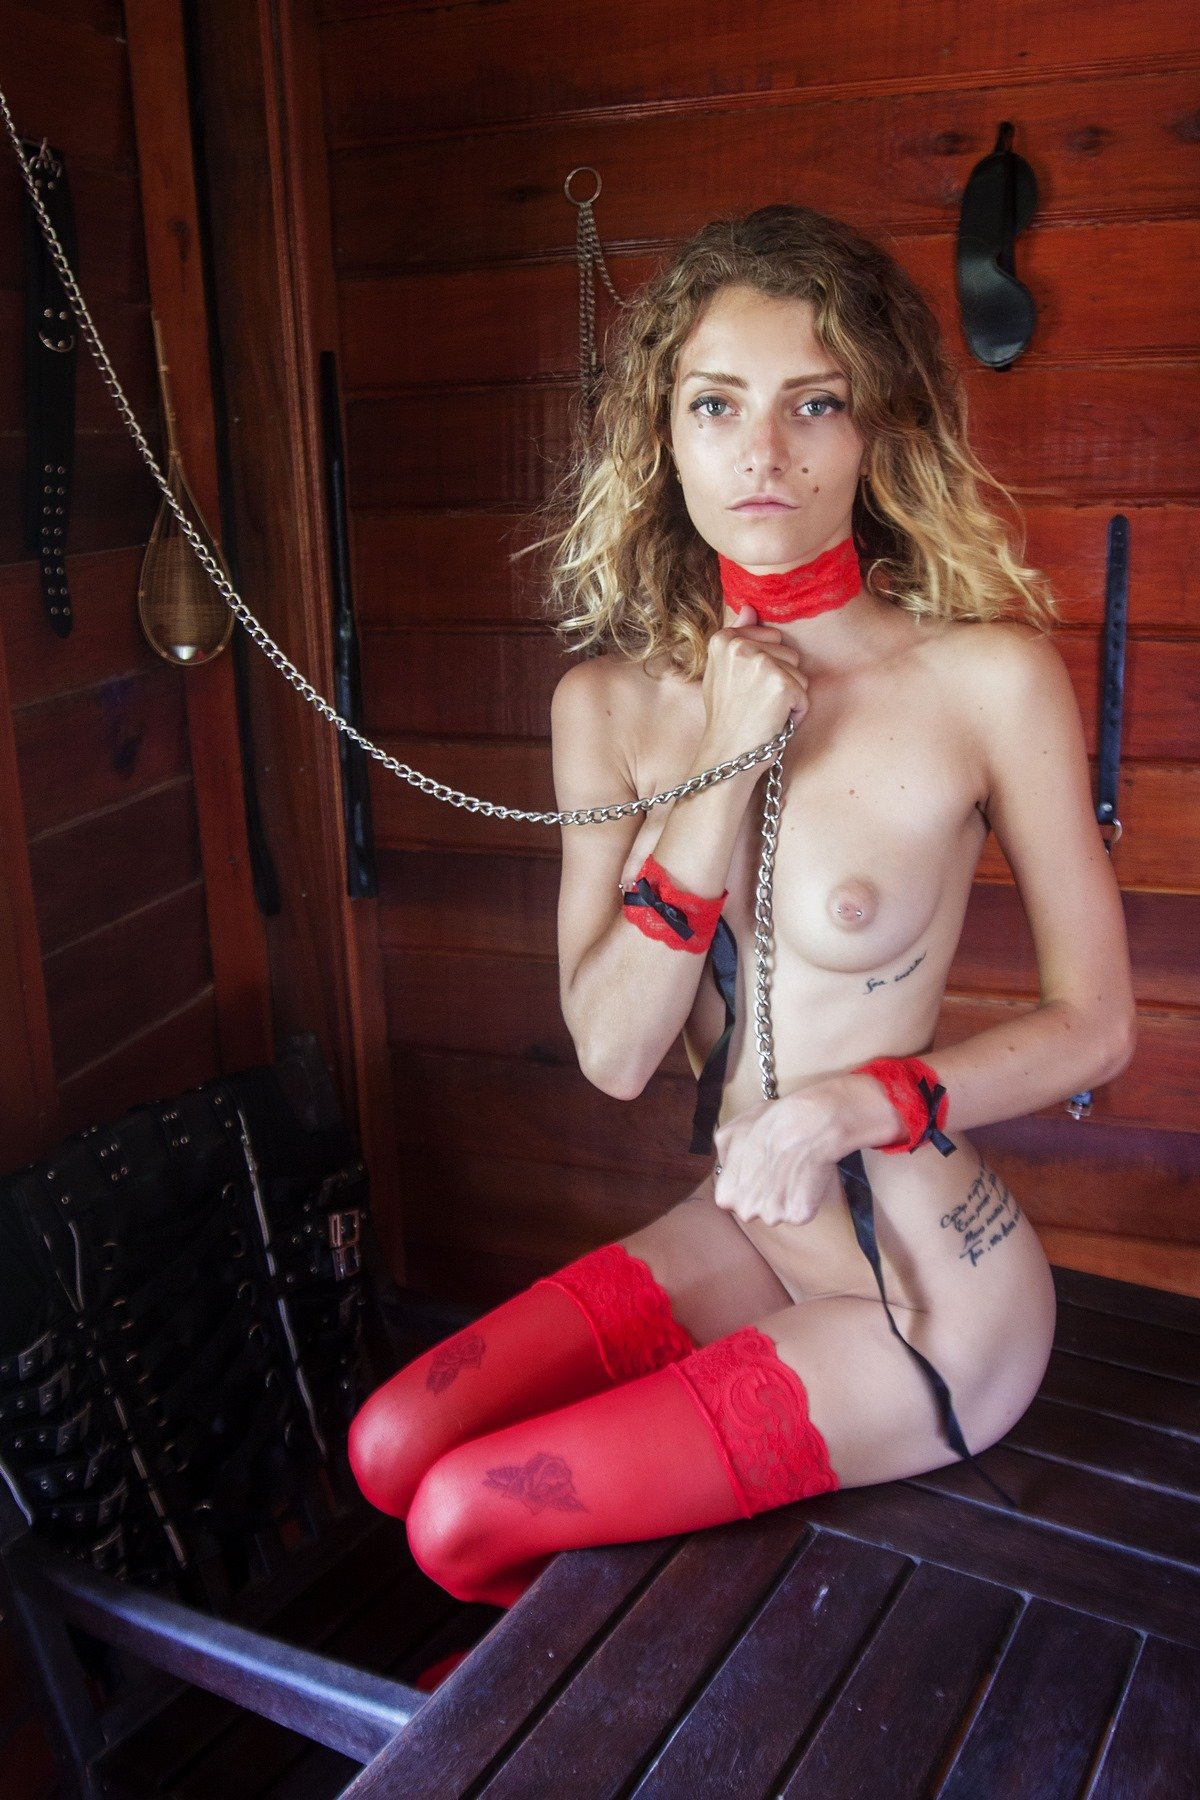 Голая светлая порно звезда в красных гетрах